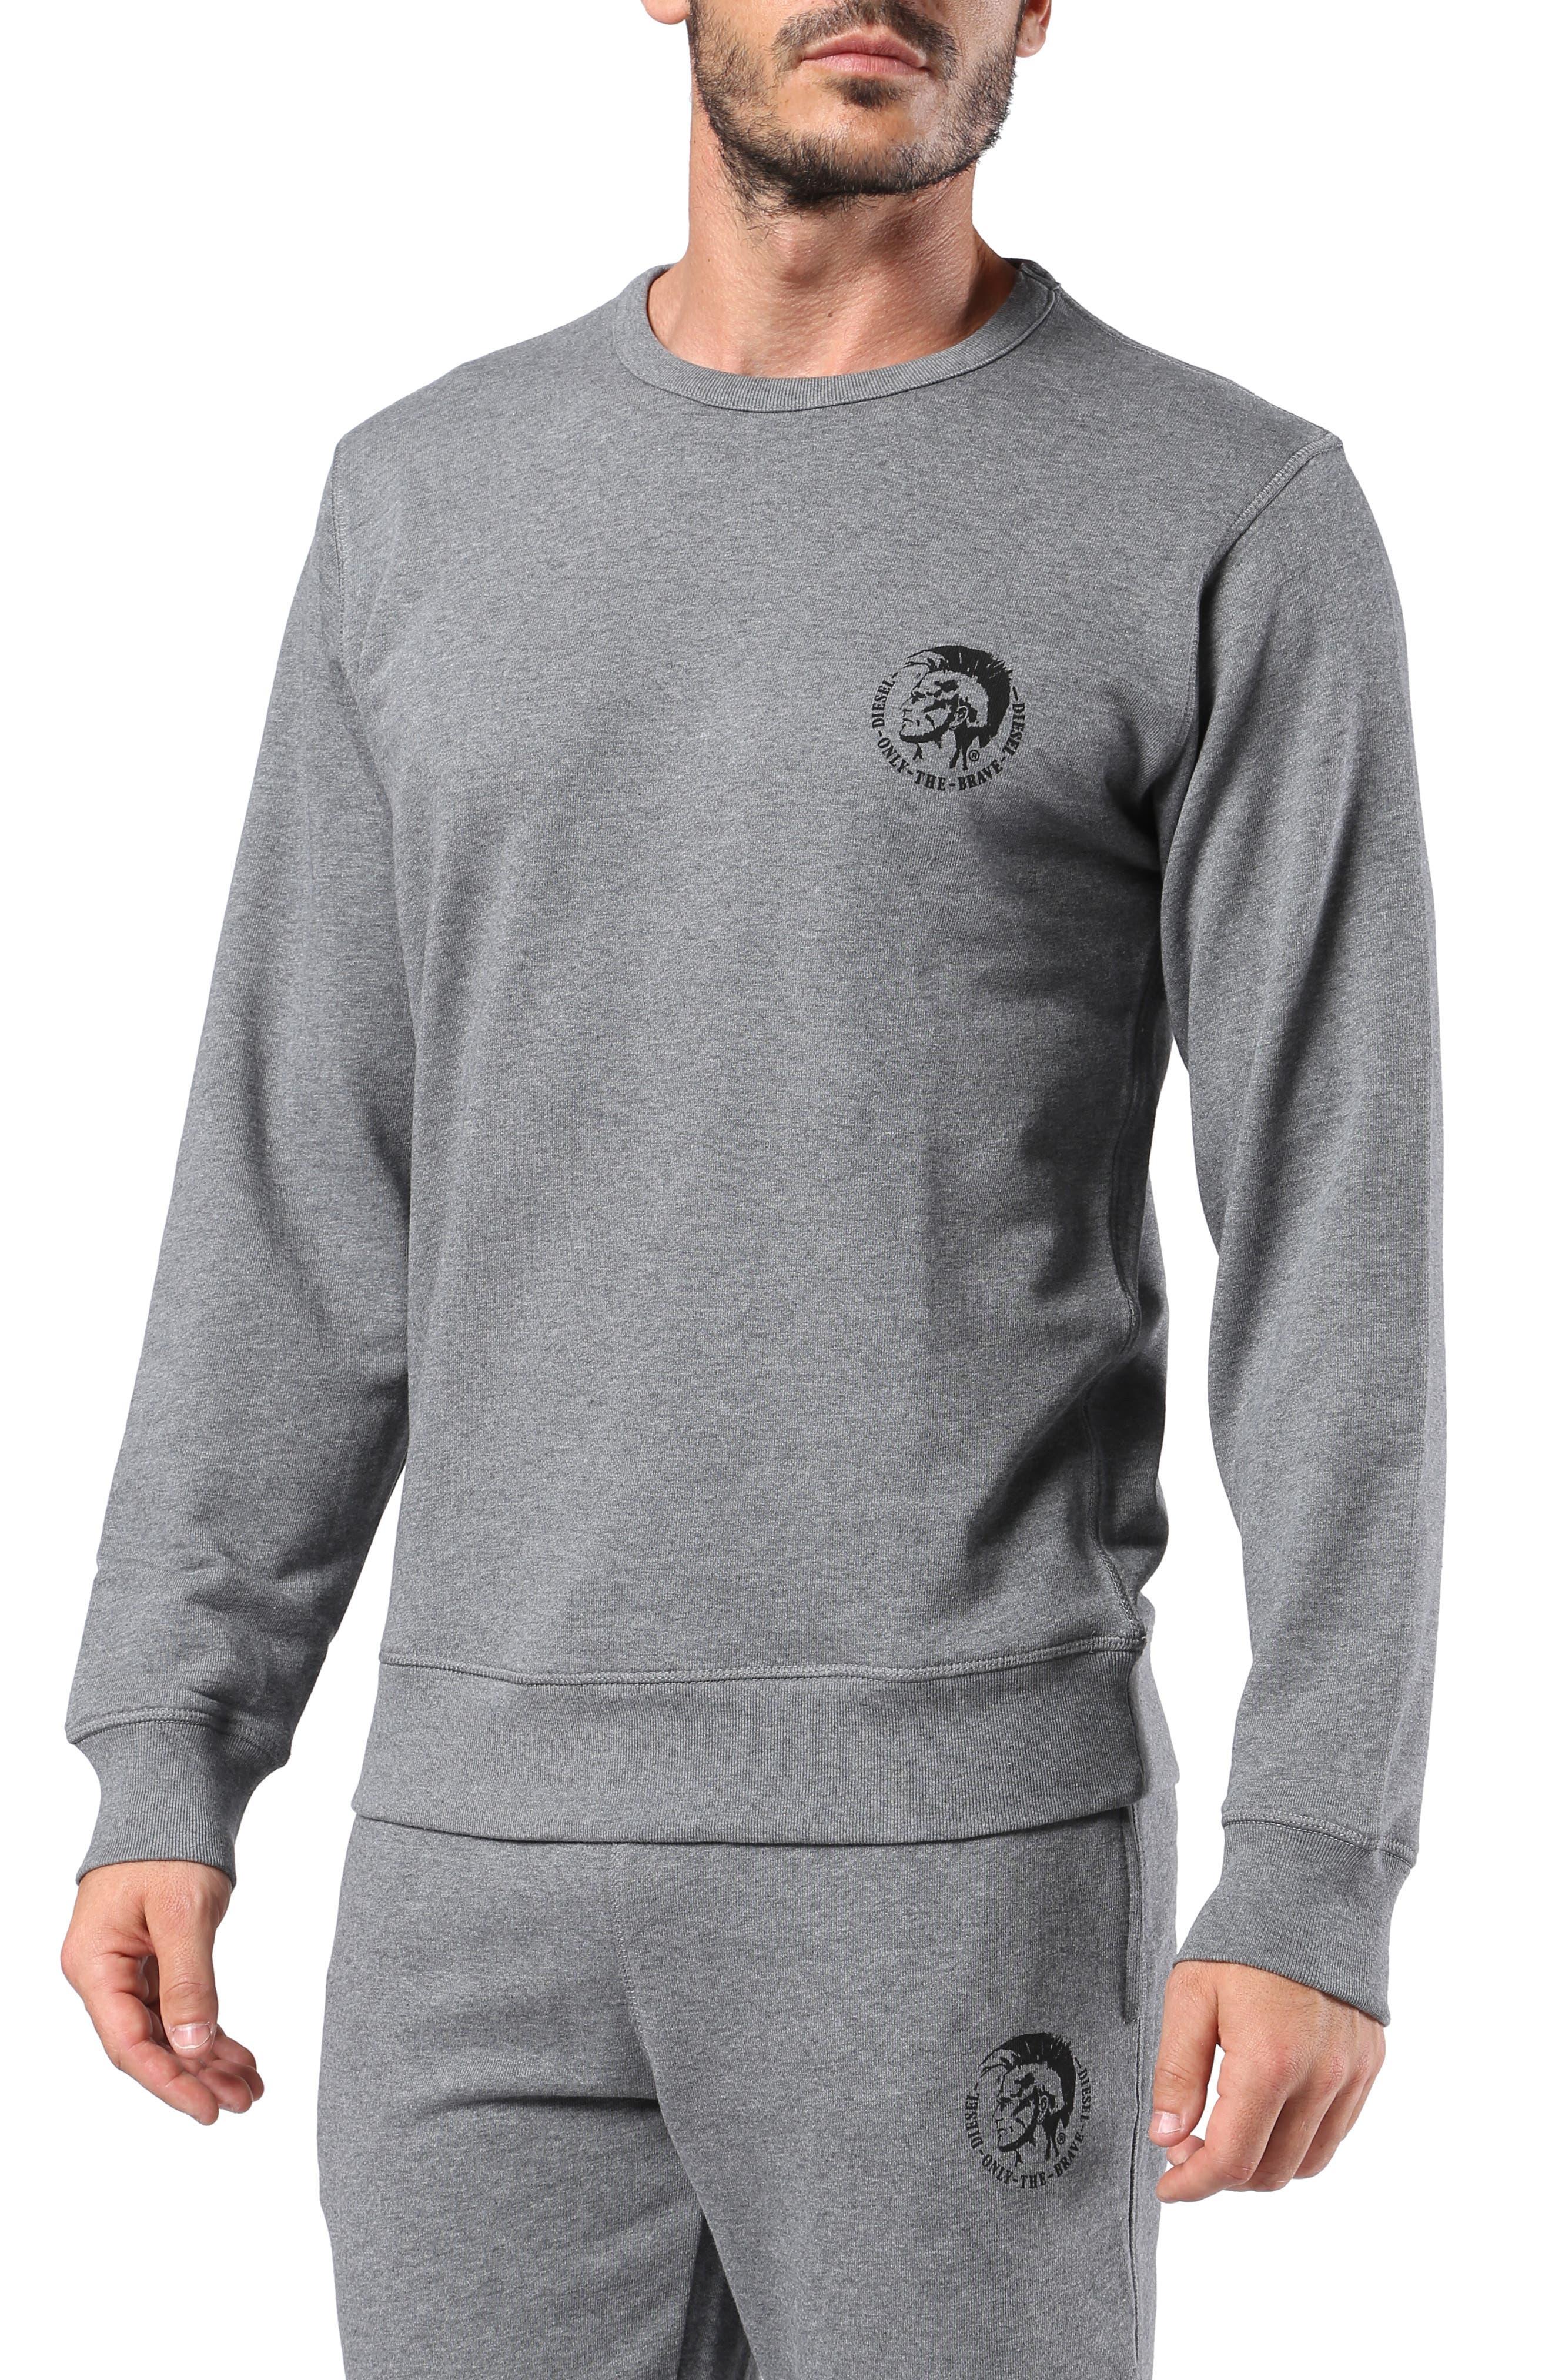 Willy Crewneck Sweatshirt, Main, color, MELANGE GREY